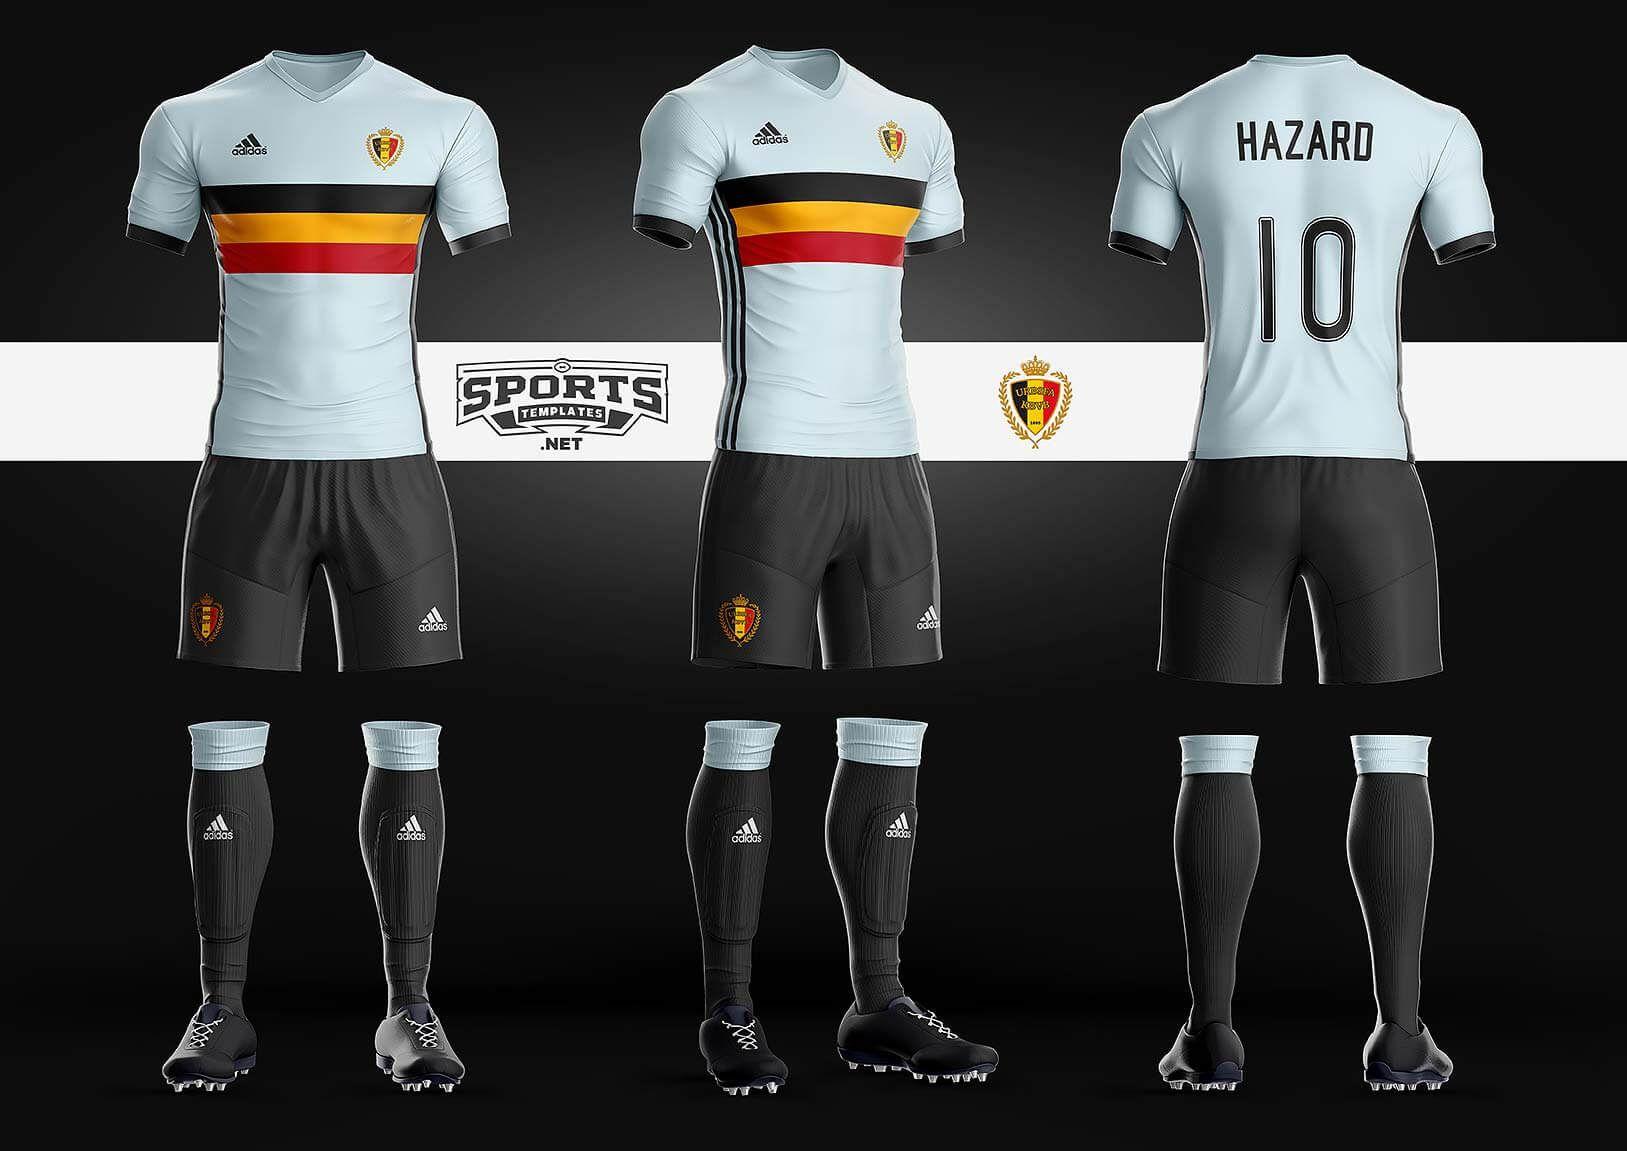 Football uniform mockup template